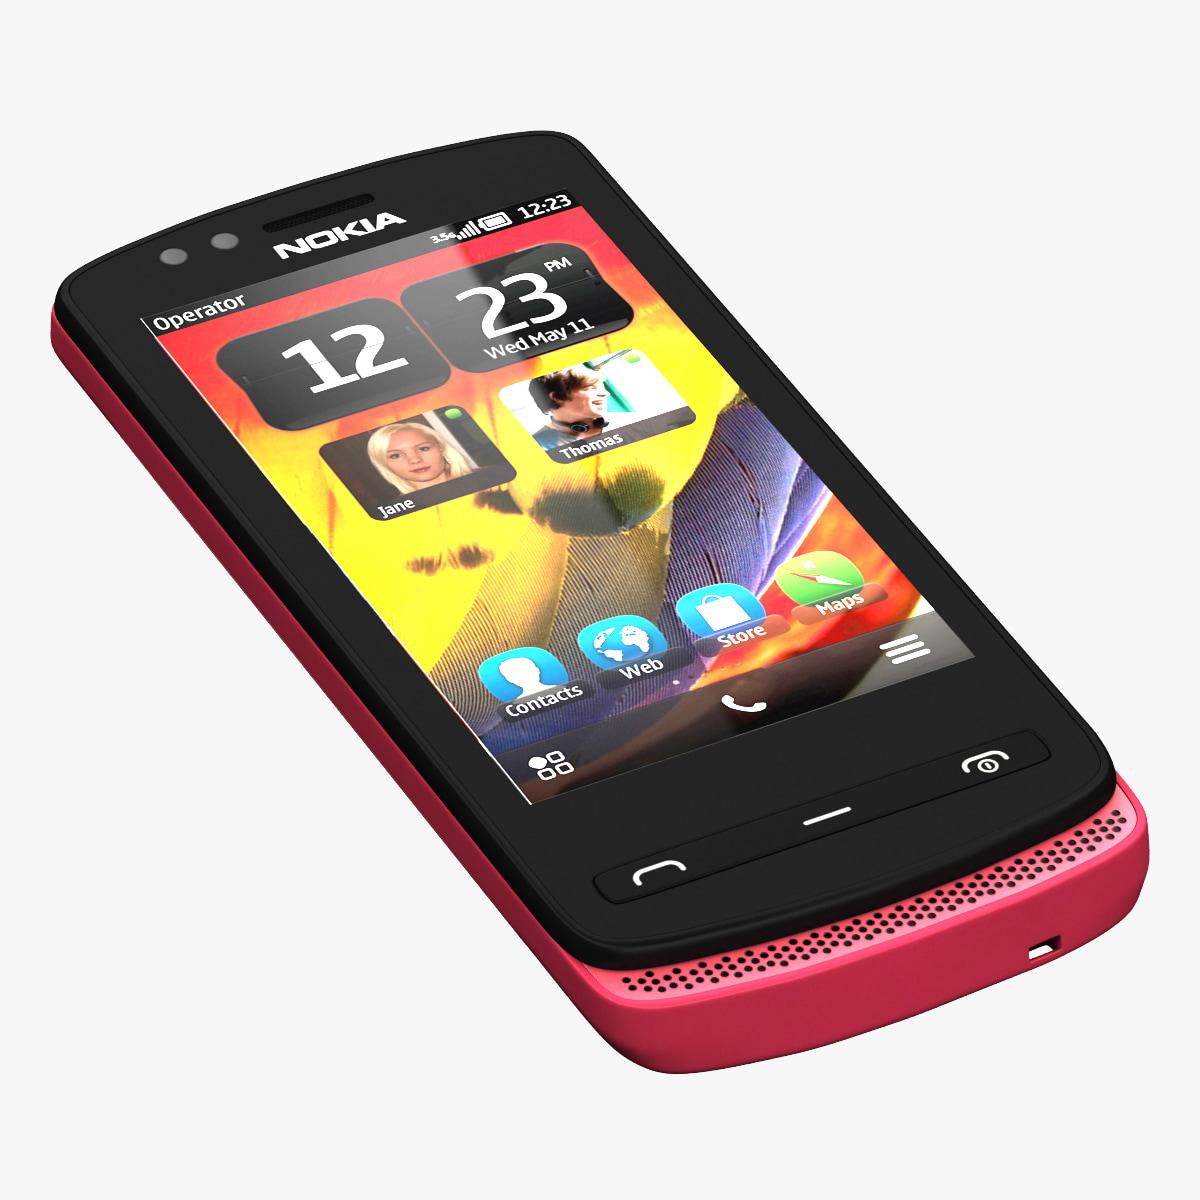 Nokia_700_Zeta_Red_247.jpg